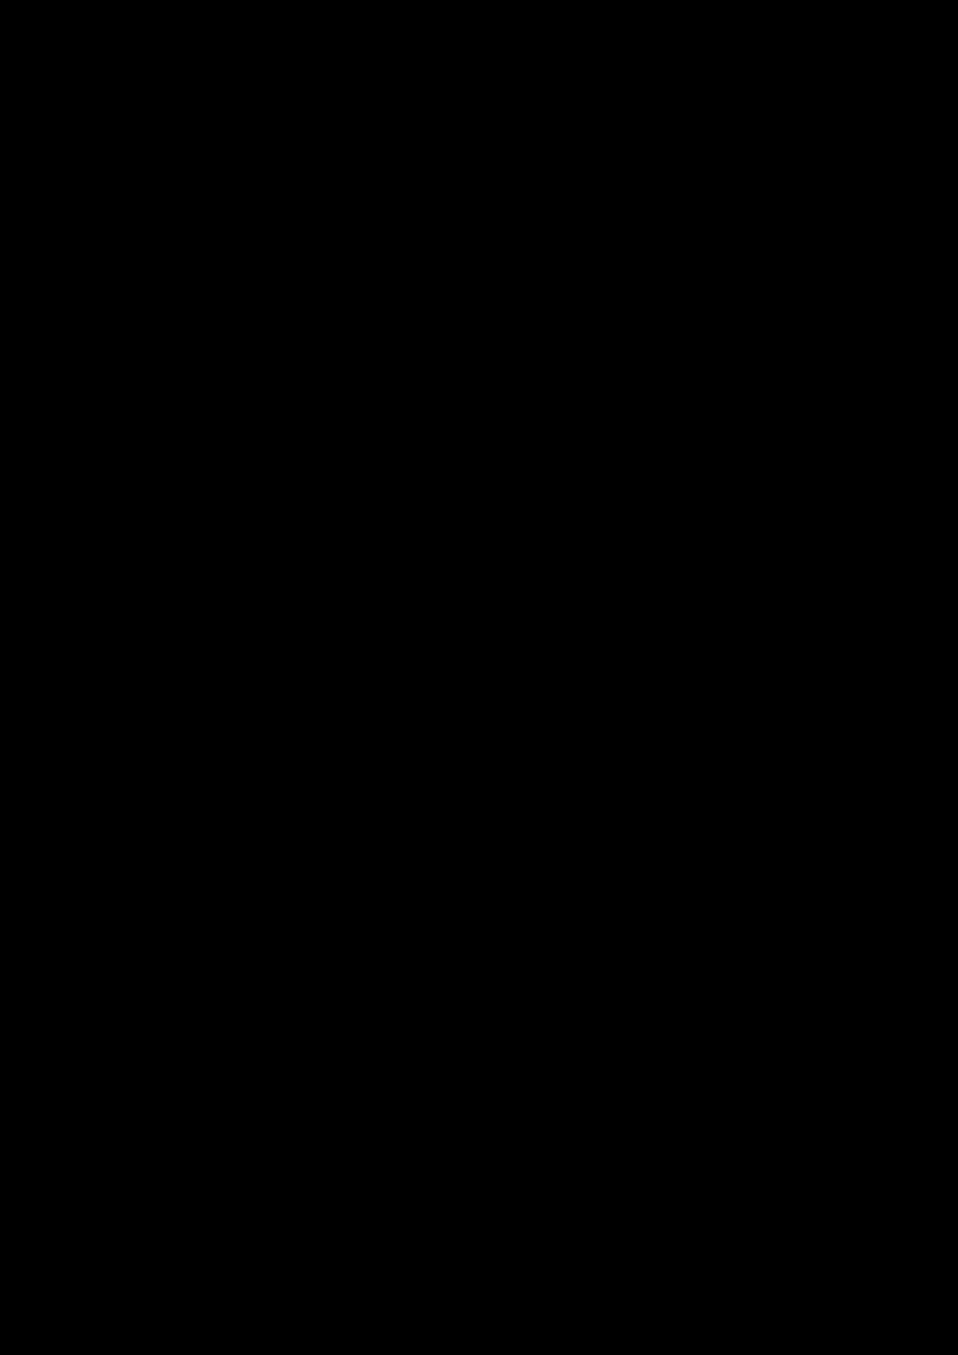 Public domain clip art. Clipart shark vector